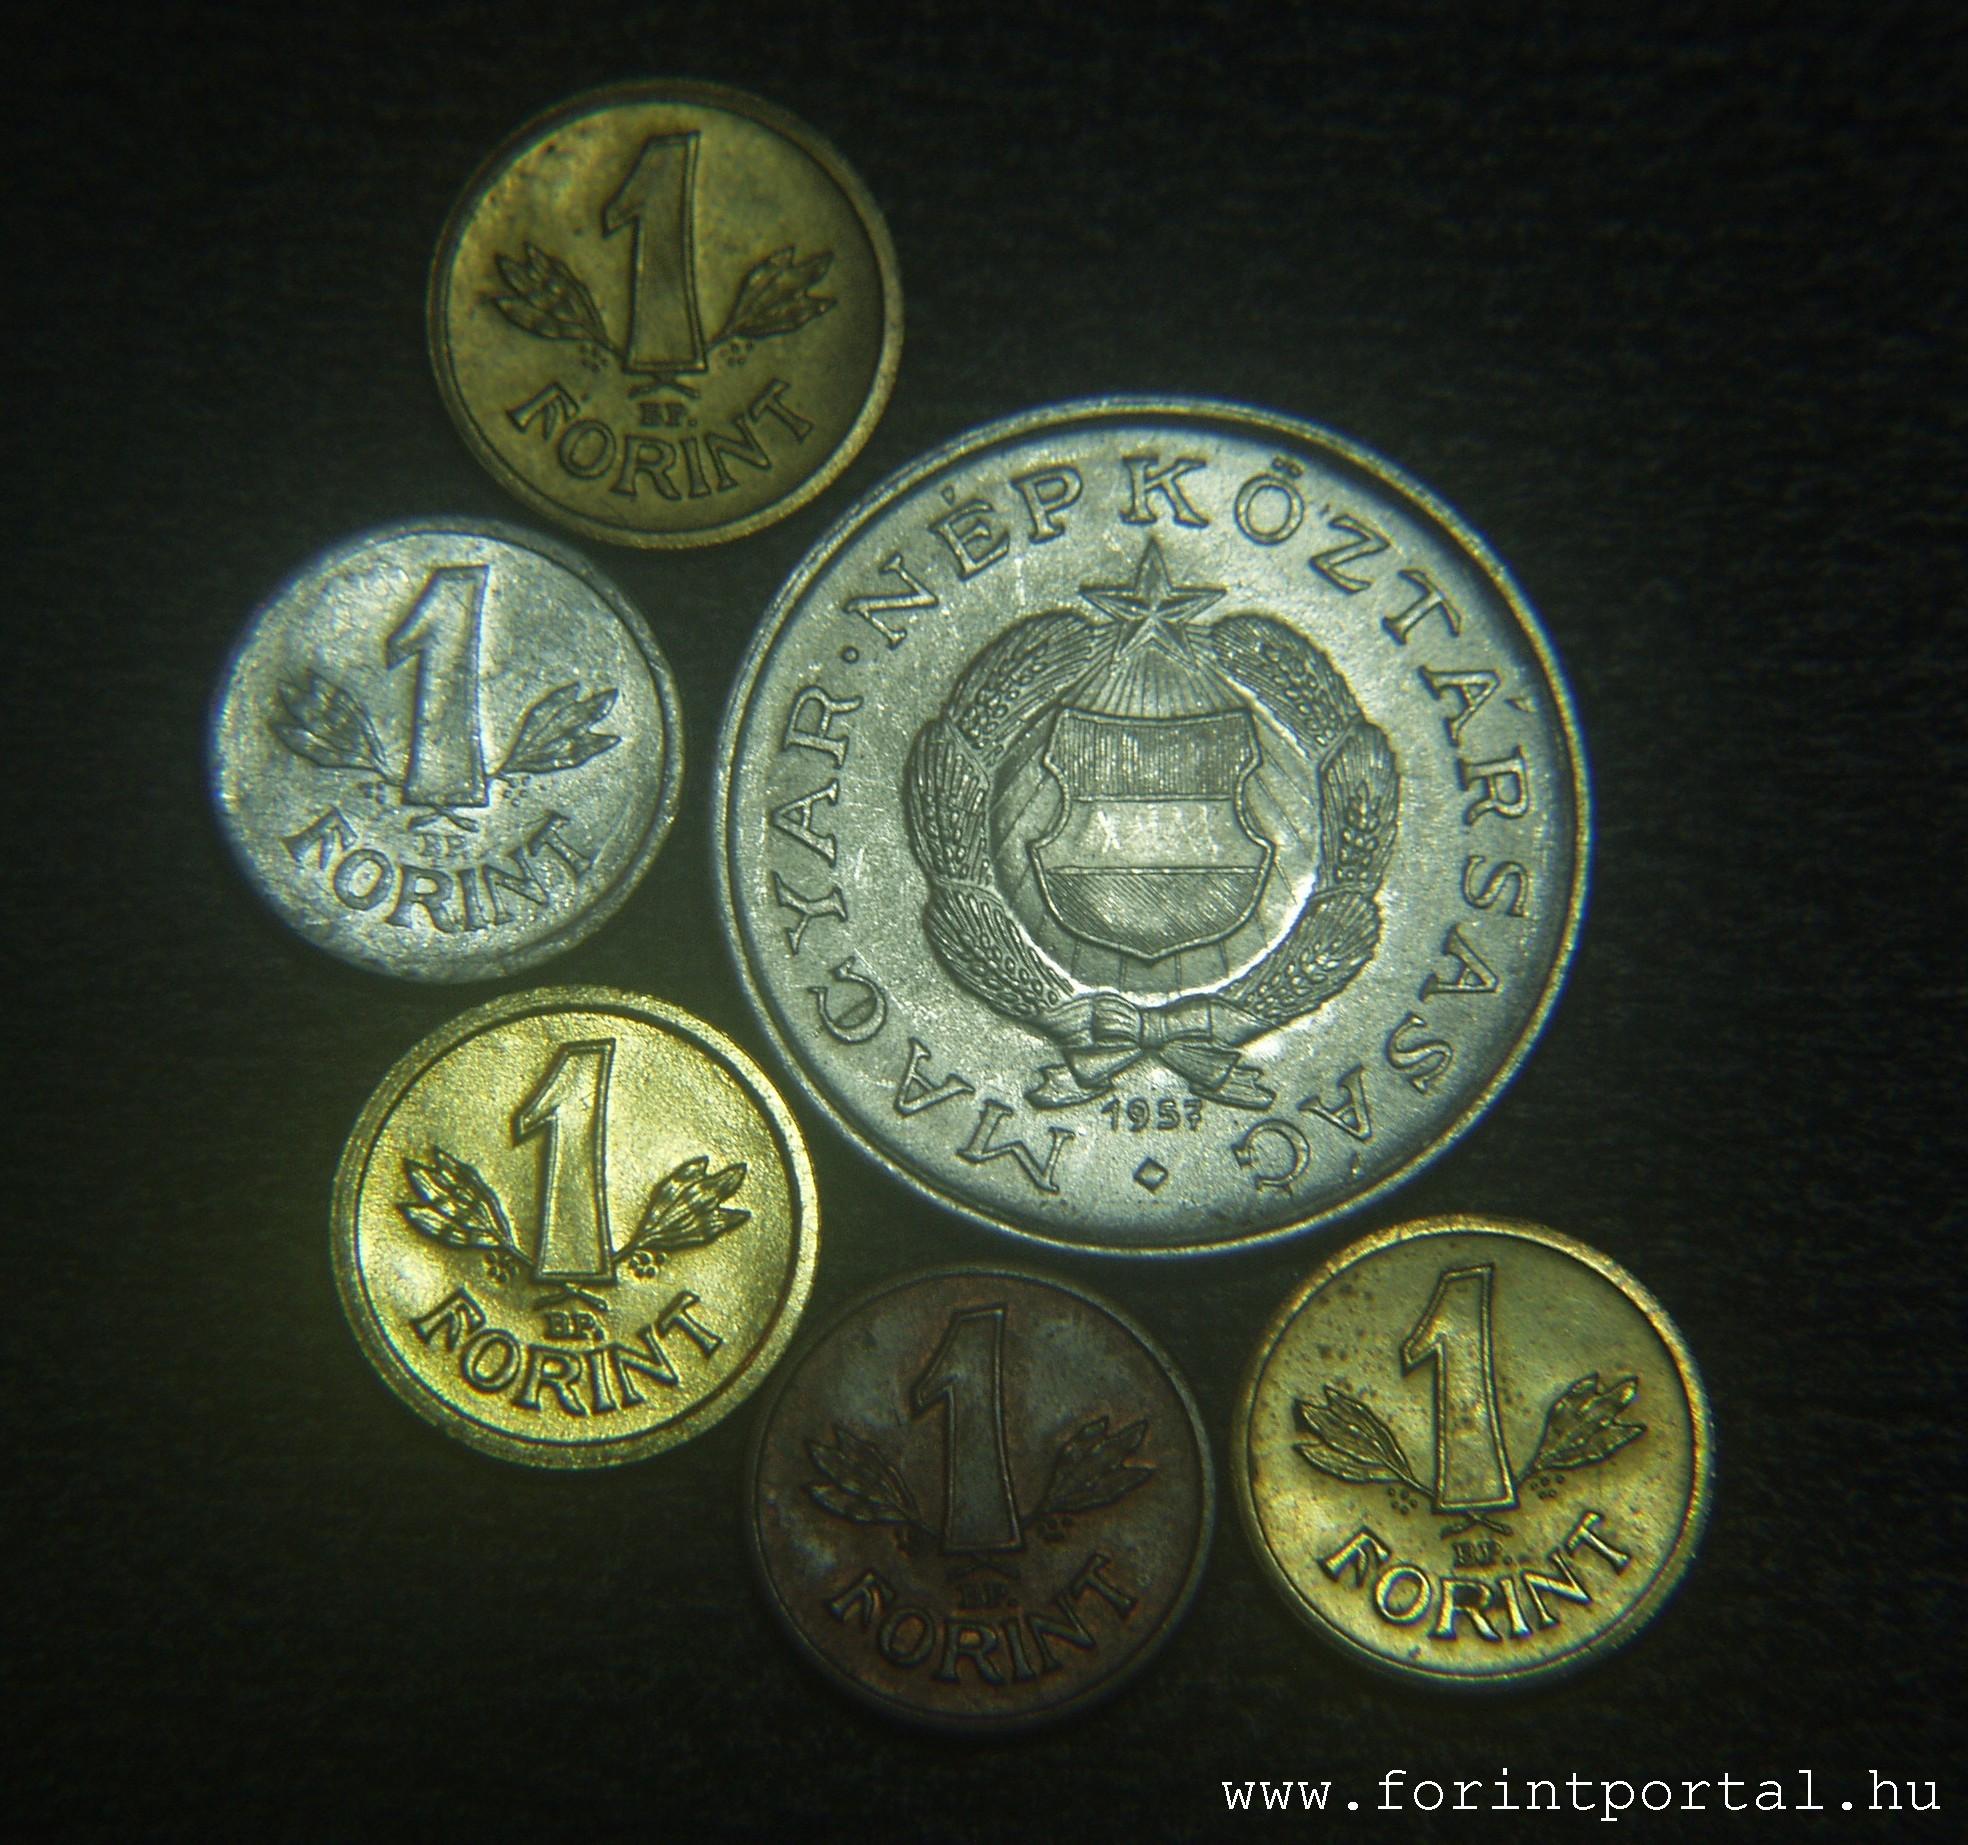 http://www.forintportal.hu/hirek/mini_1-forintos_ermek/mini_1-forintos_ermek_mini-minik_es_nagy_aluminium.jpg